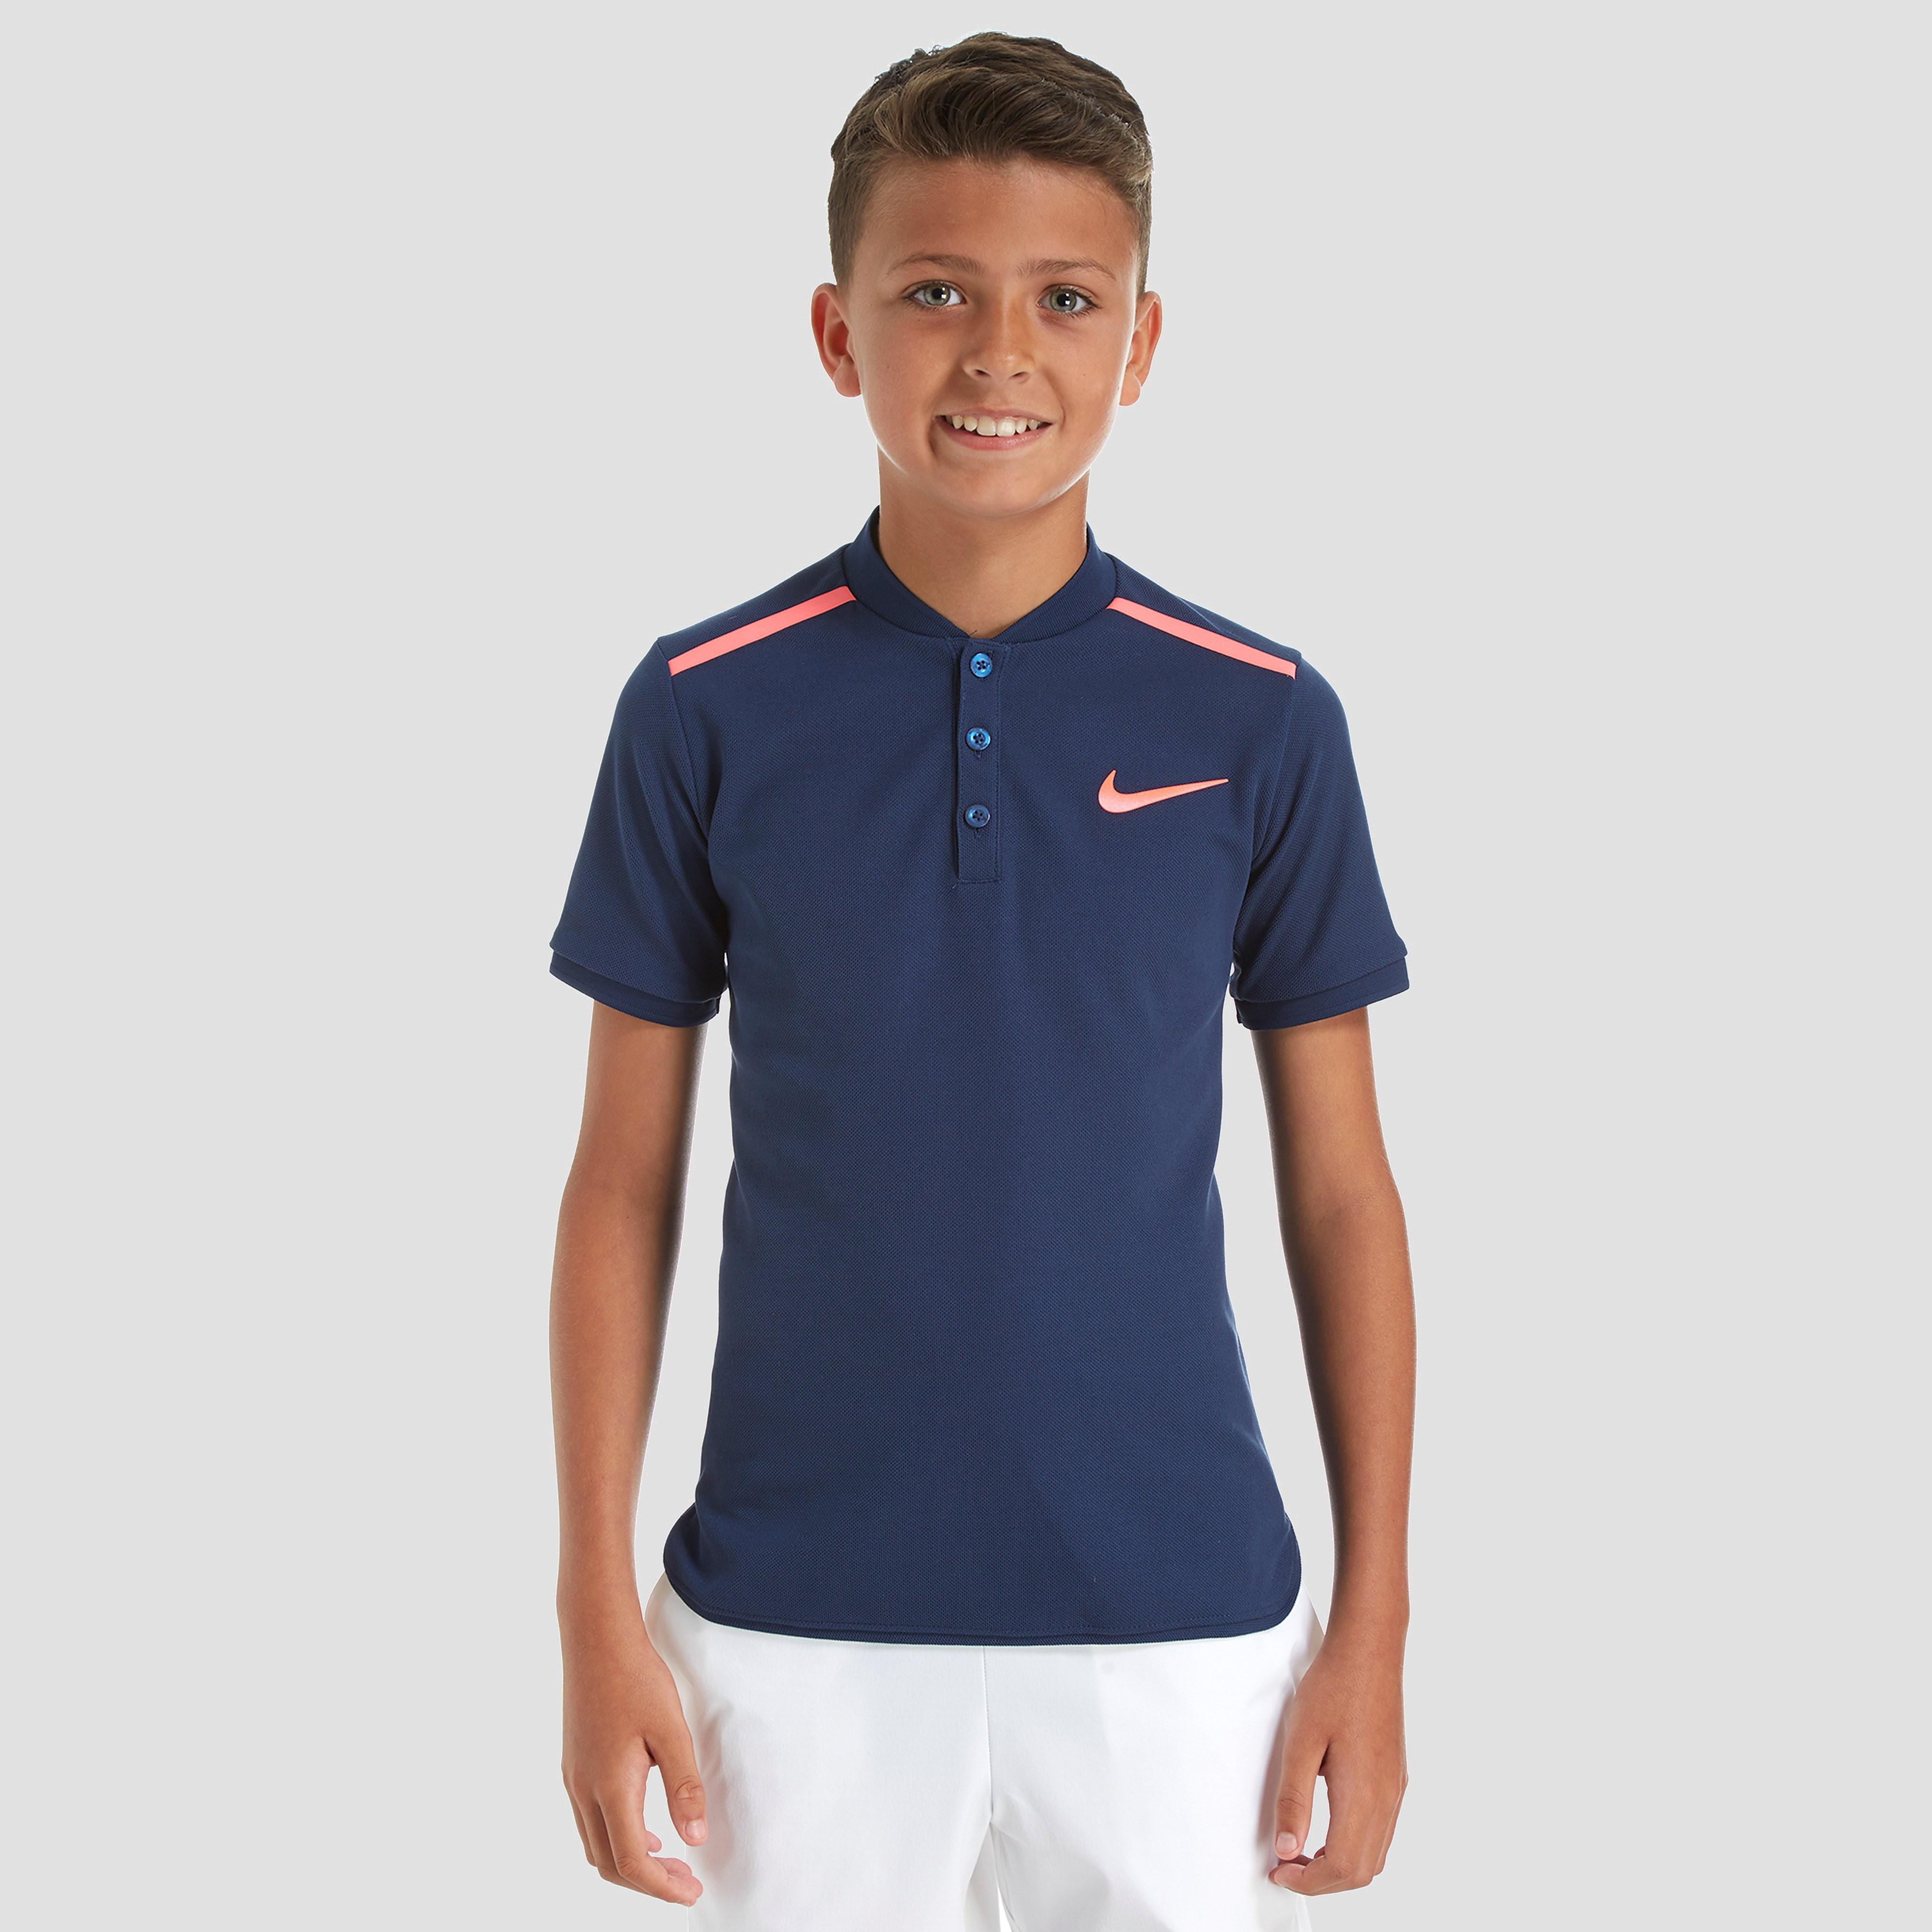 Nike Junior SS Polo Shirt